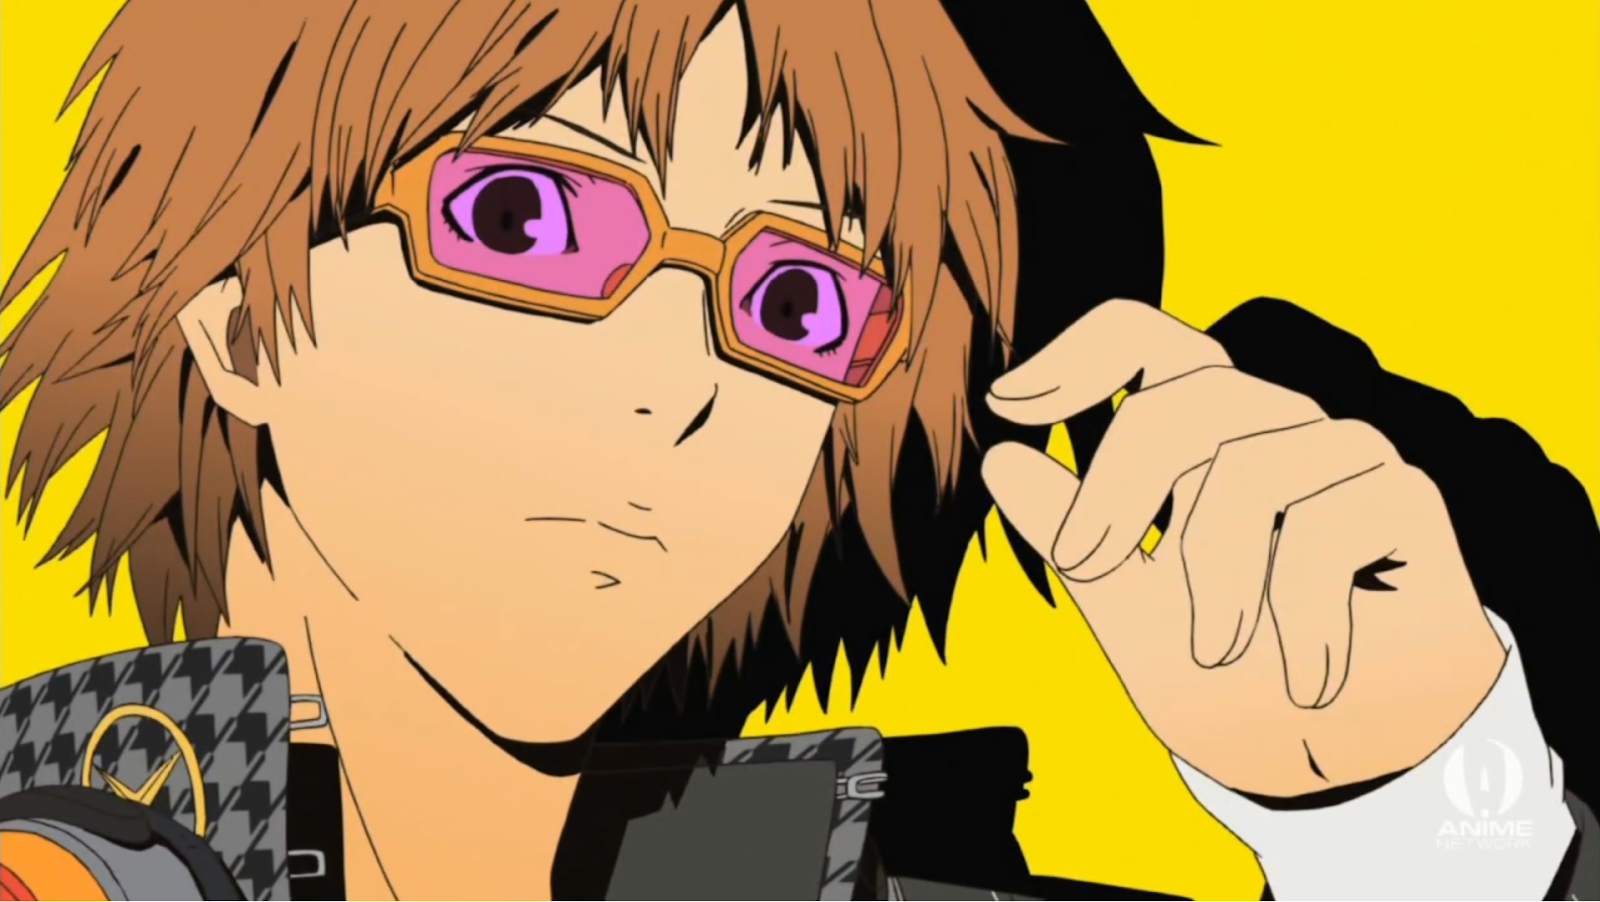 Persona 4 The Animation Yosuke Hanamura